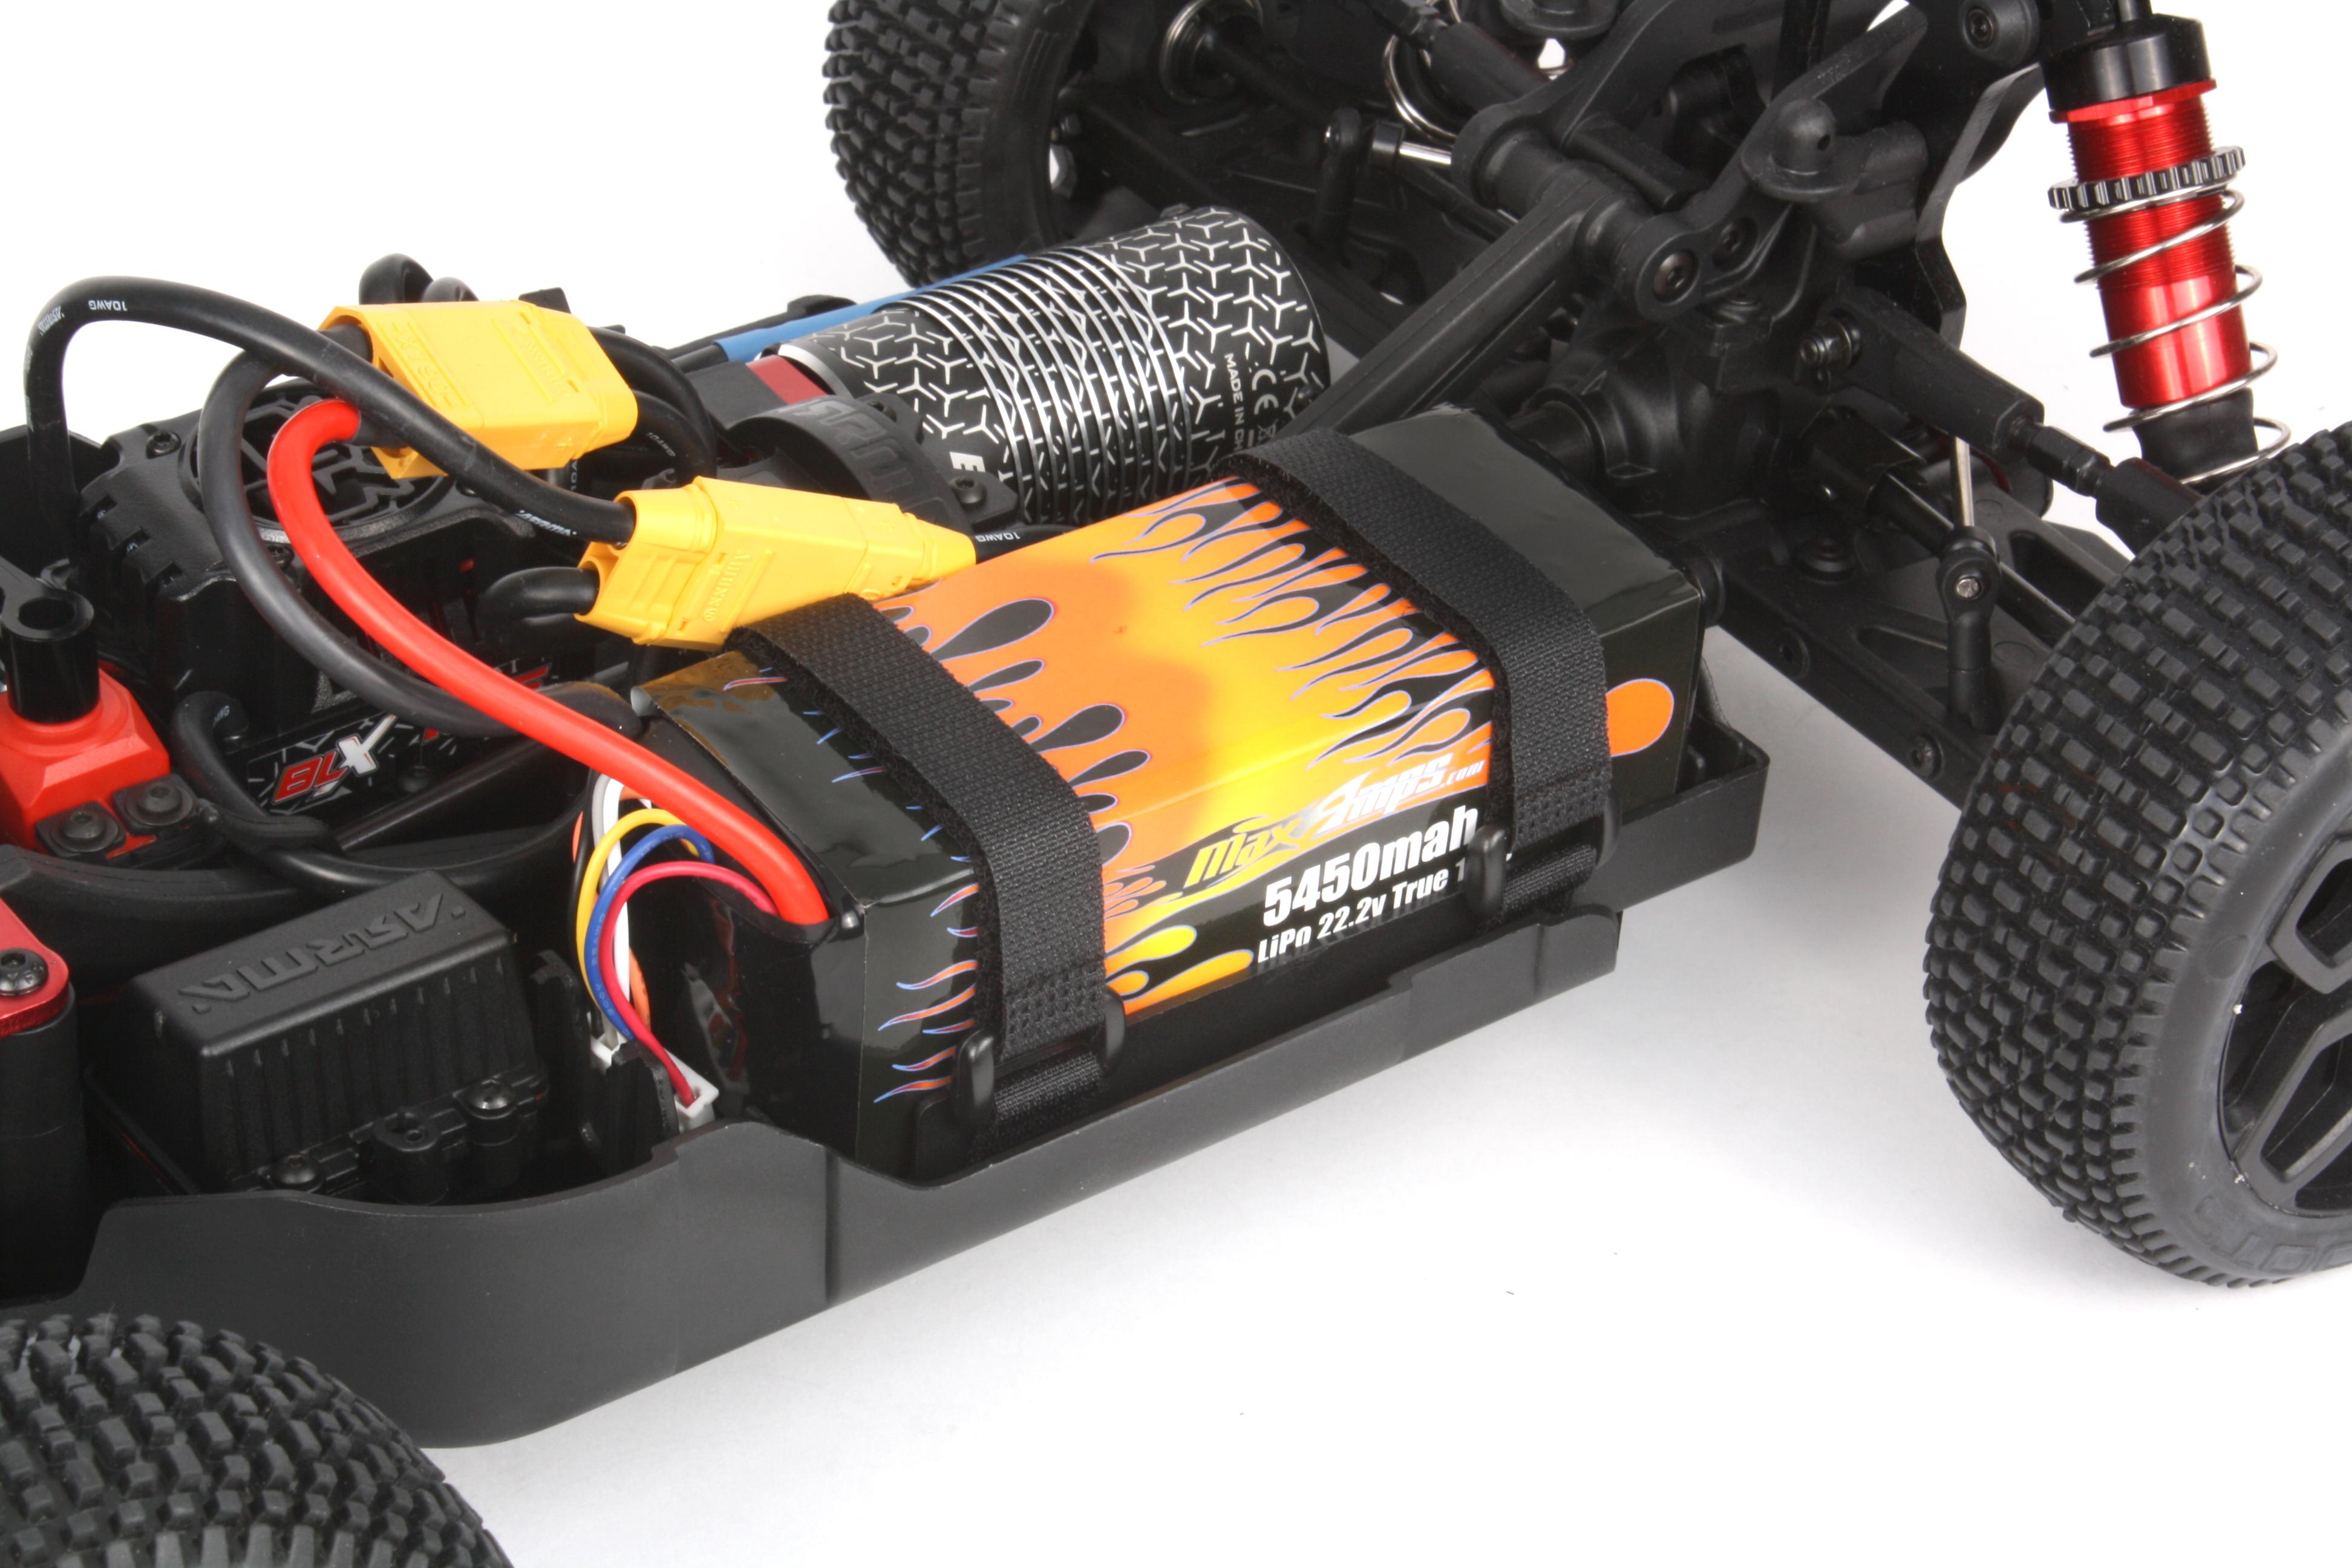 Big_battery